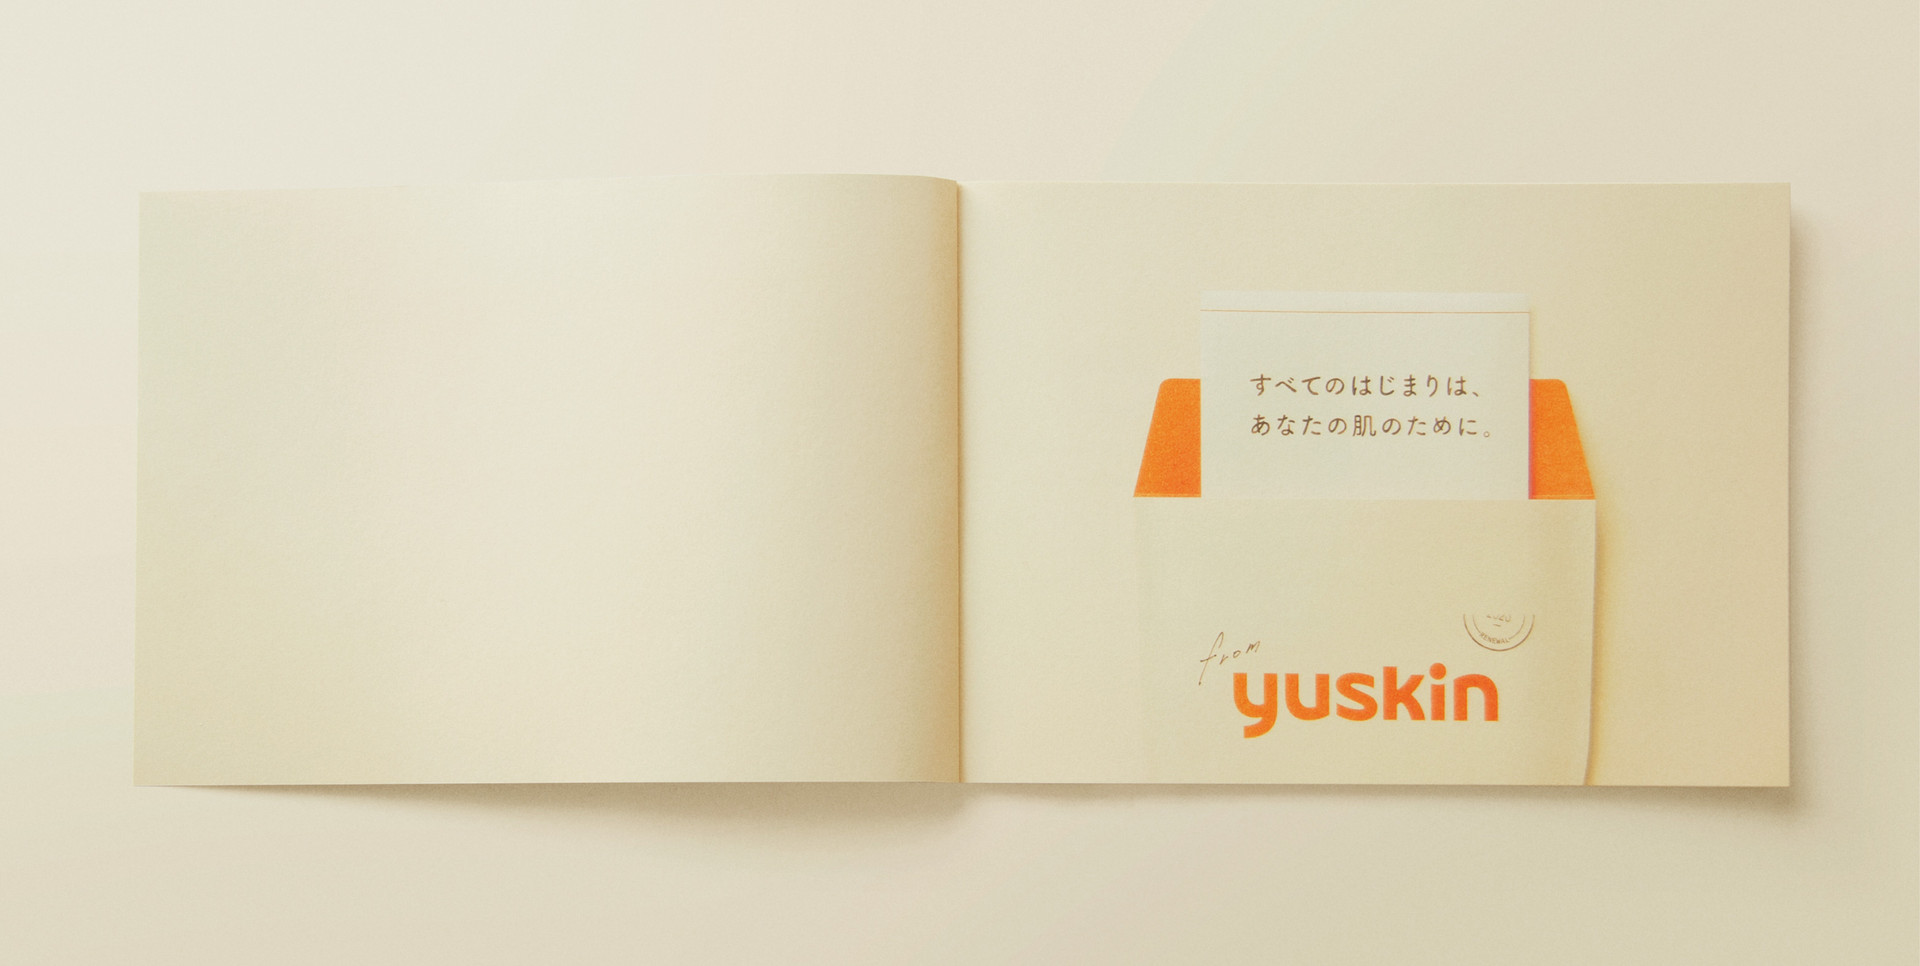 yuskin_9.jpg